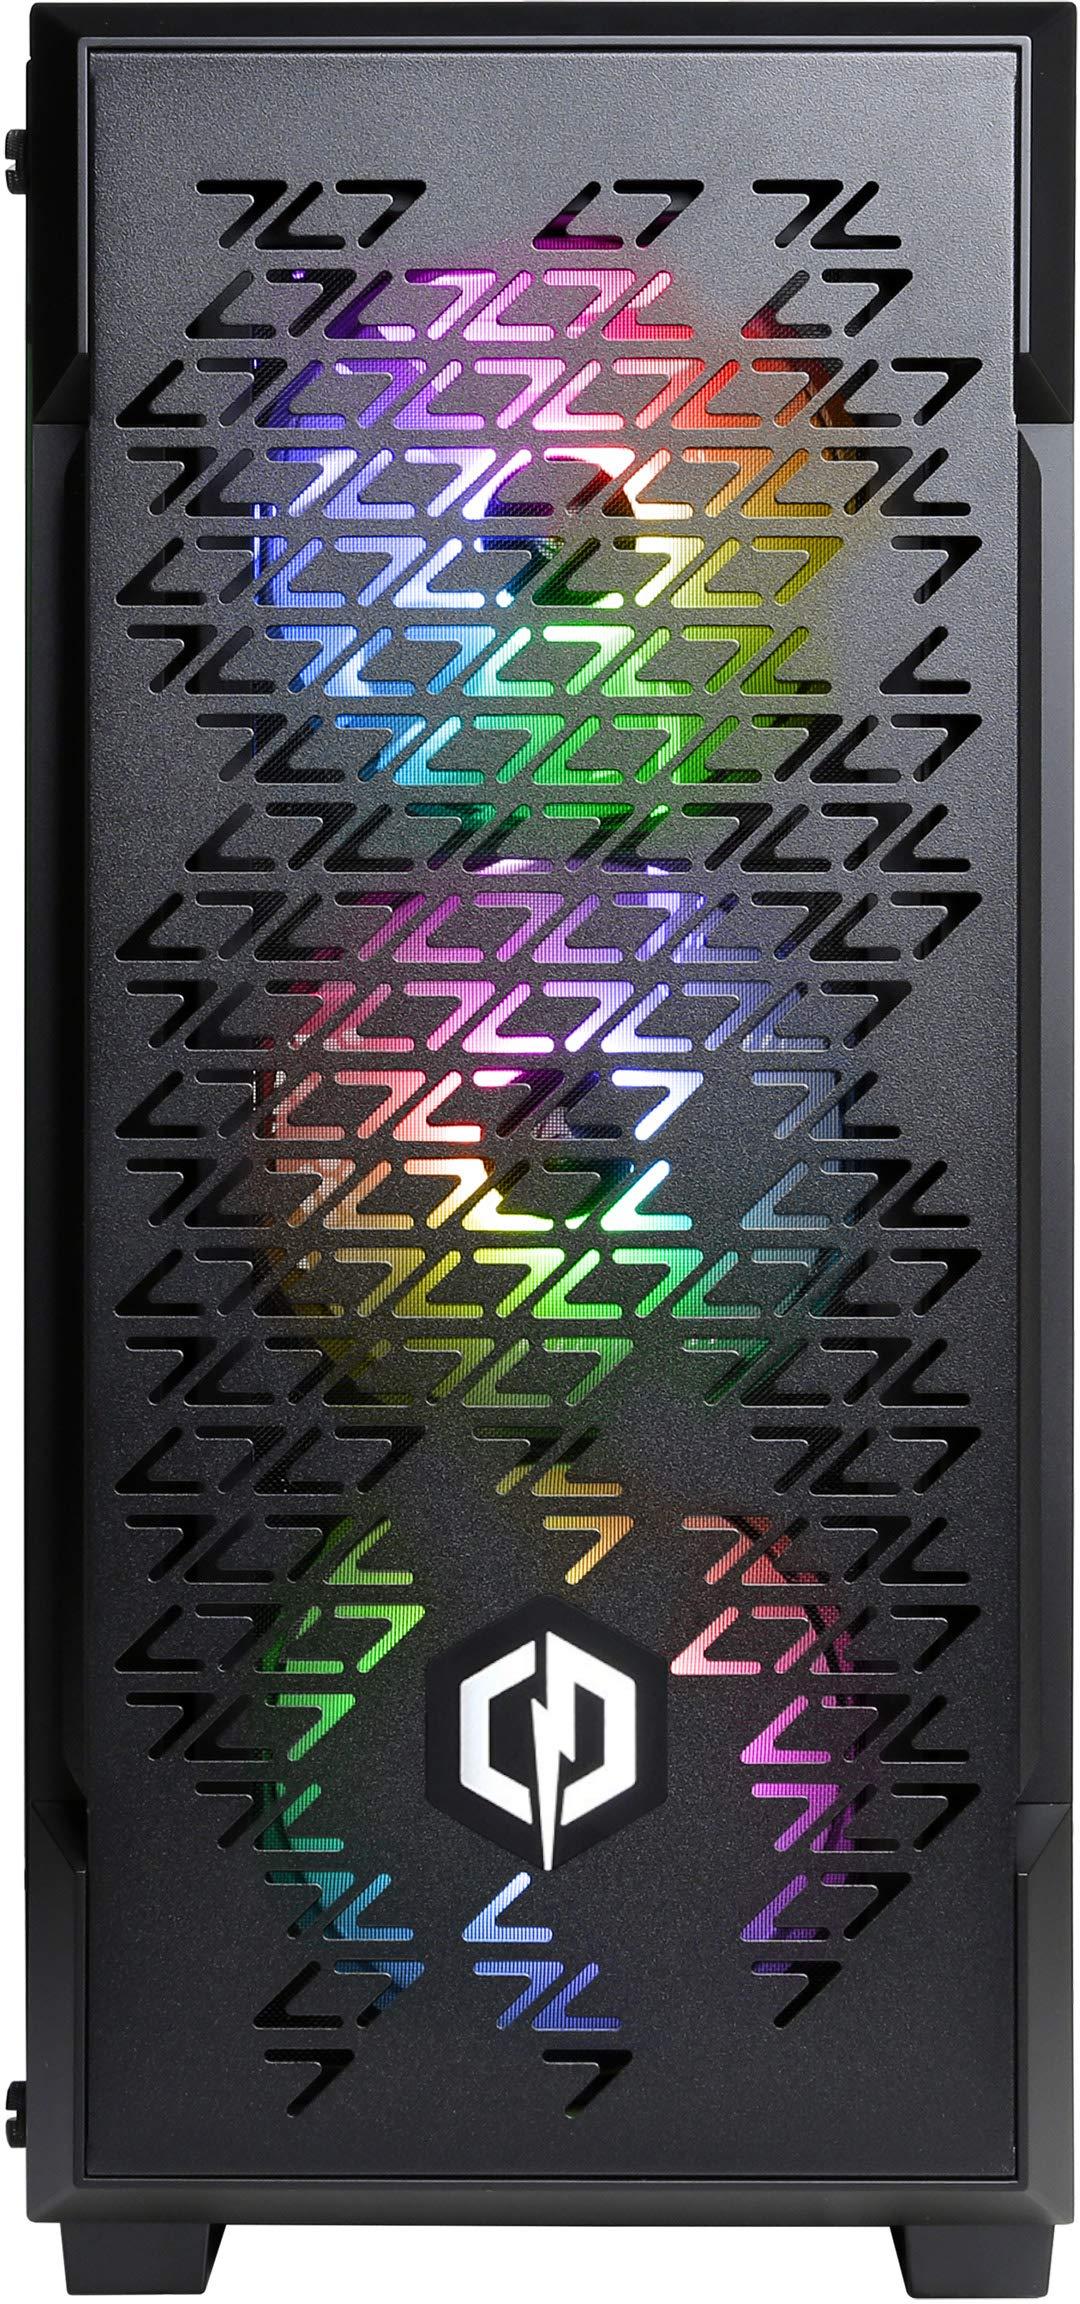 CyberpowerPC-Centurion-Gaming-PC